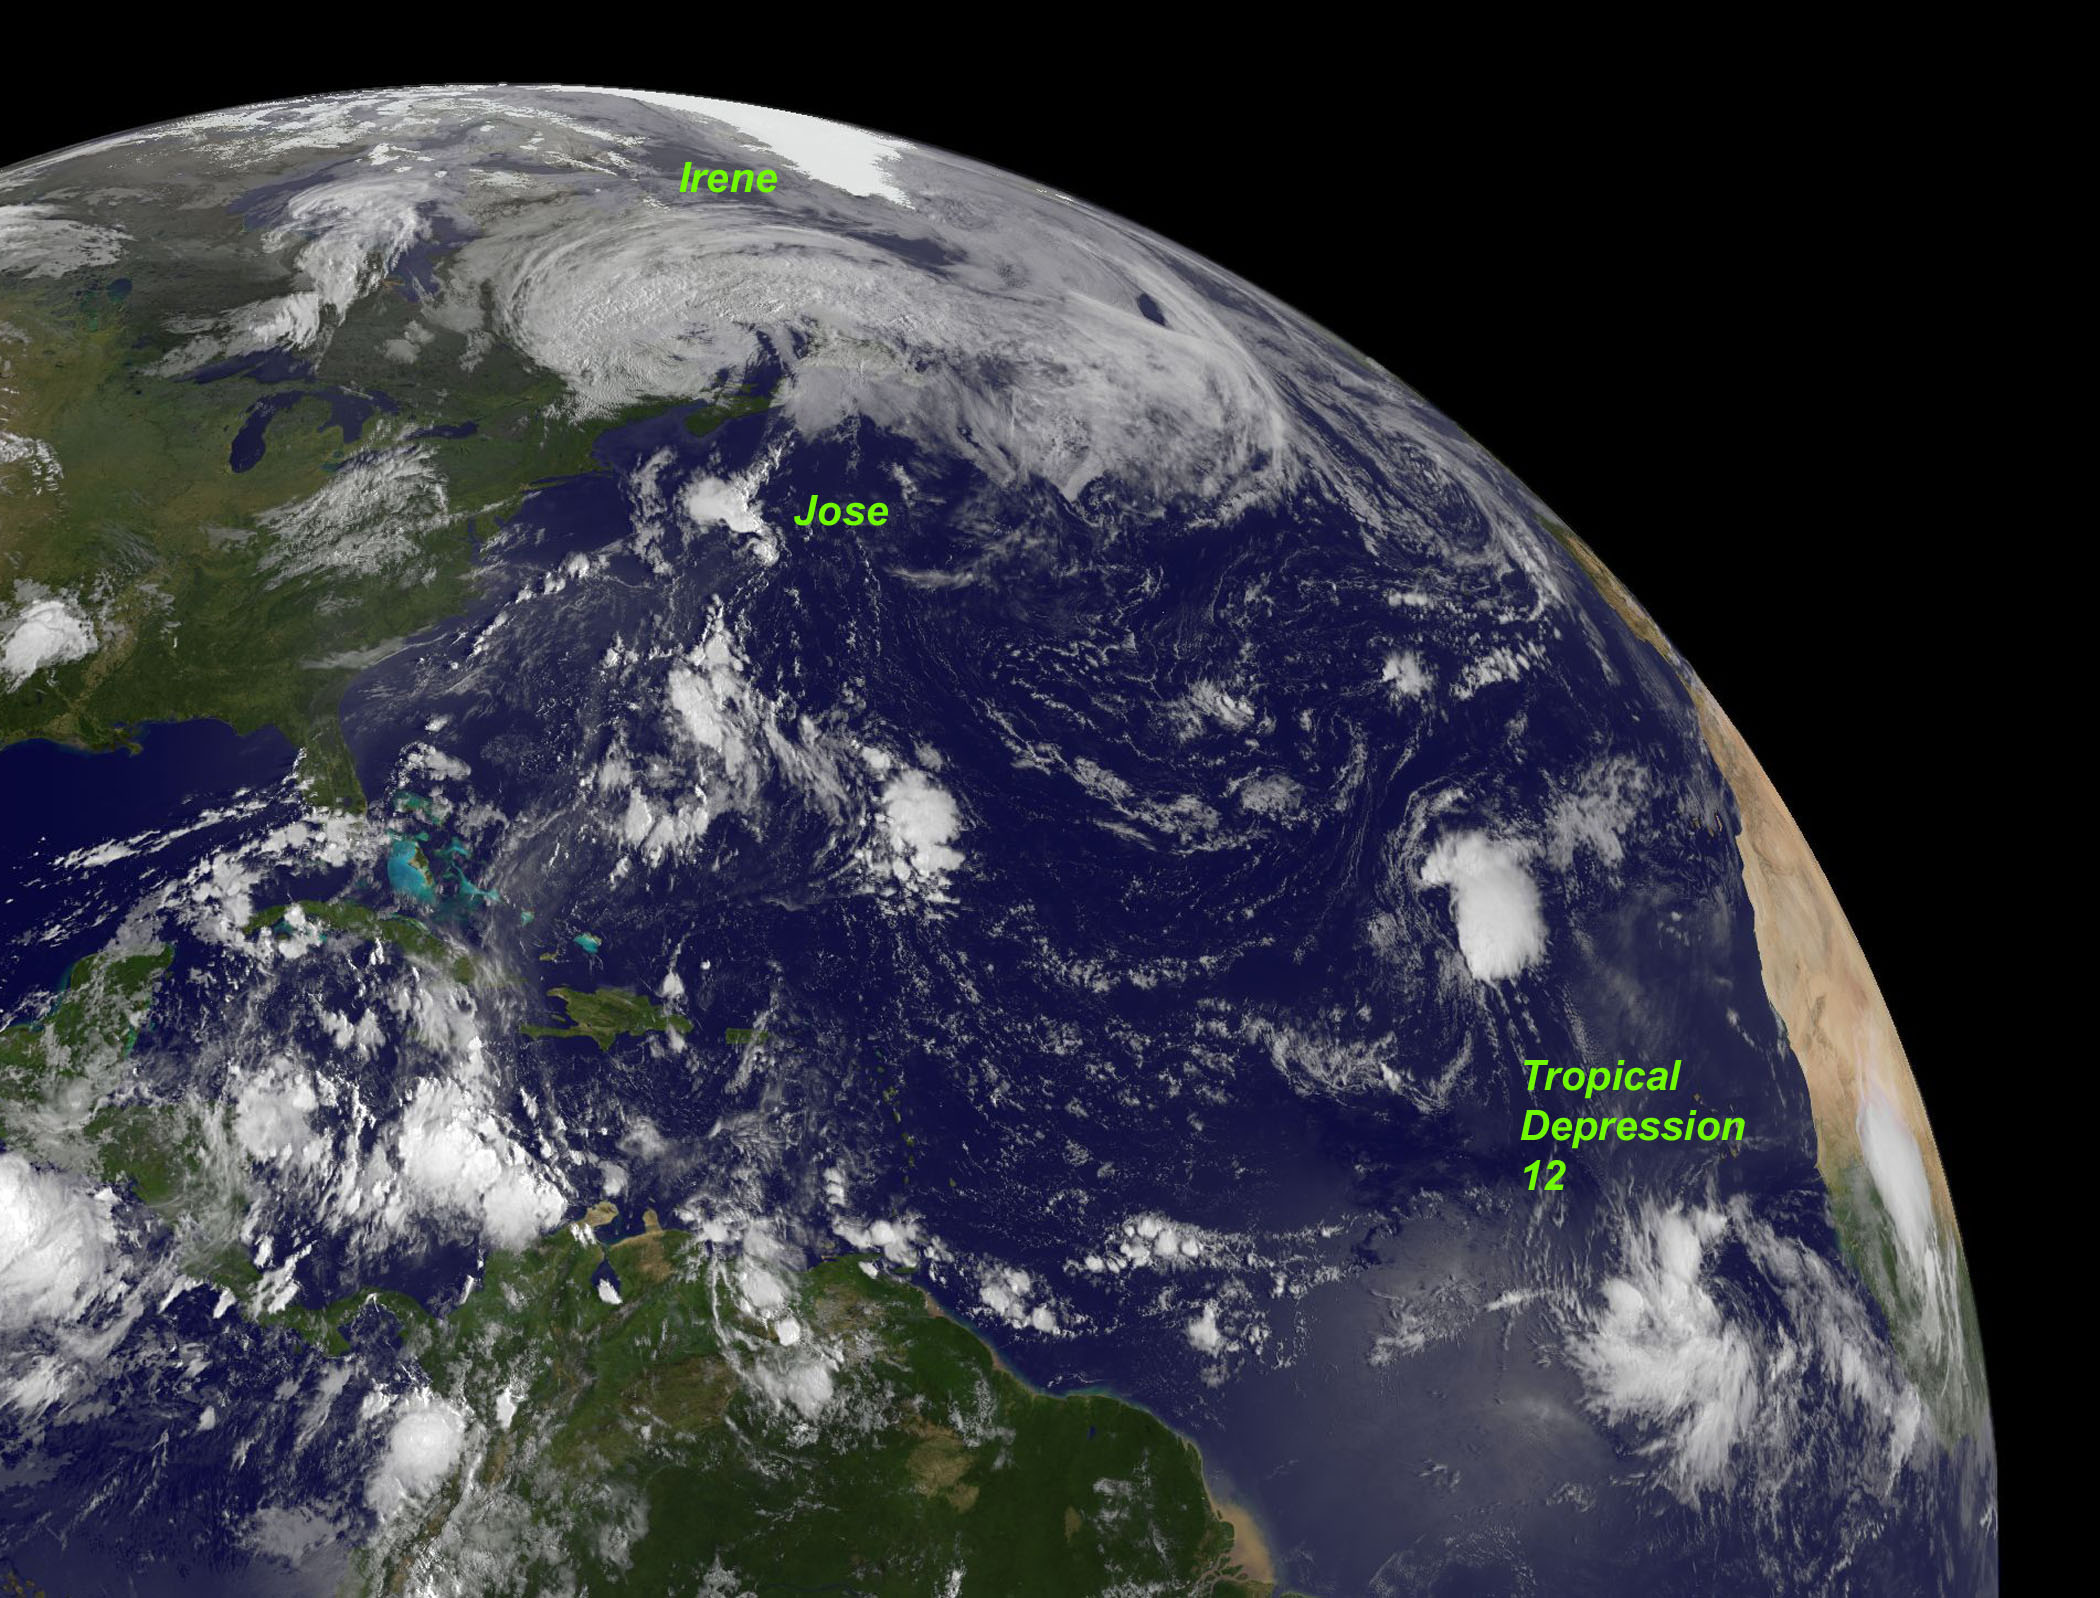 NASA - Hurricane Season 2011: Jose (Atlantic Ocean)